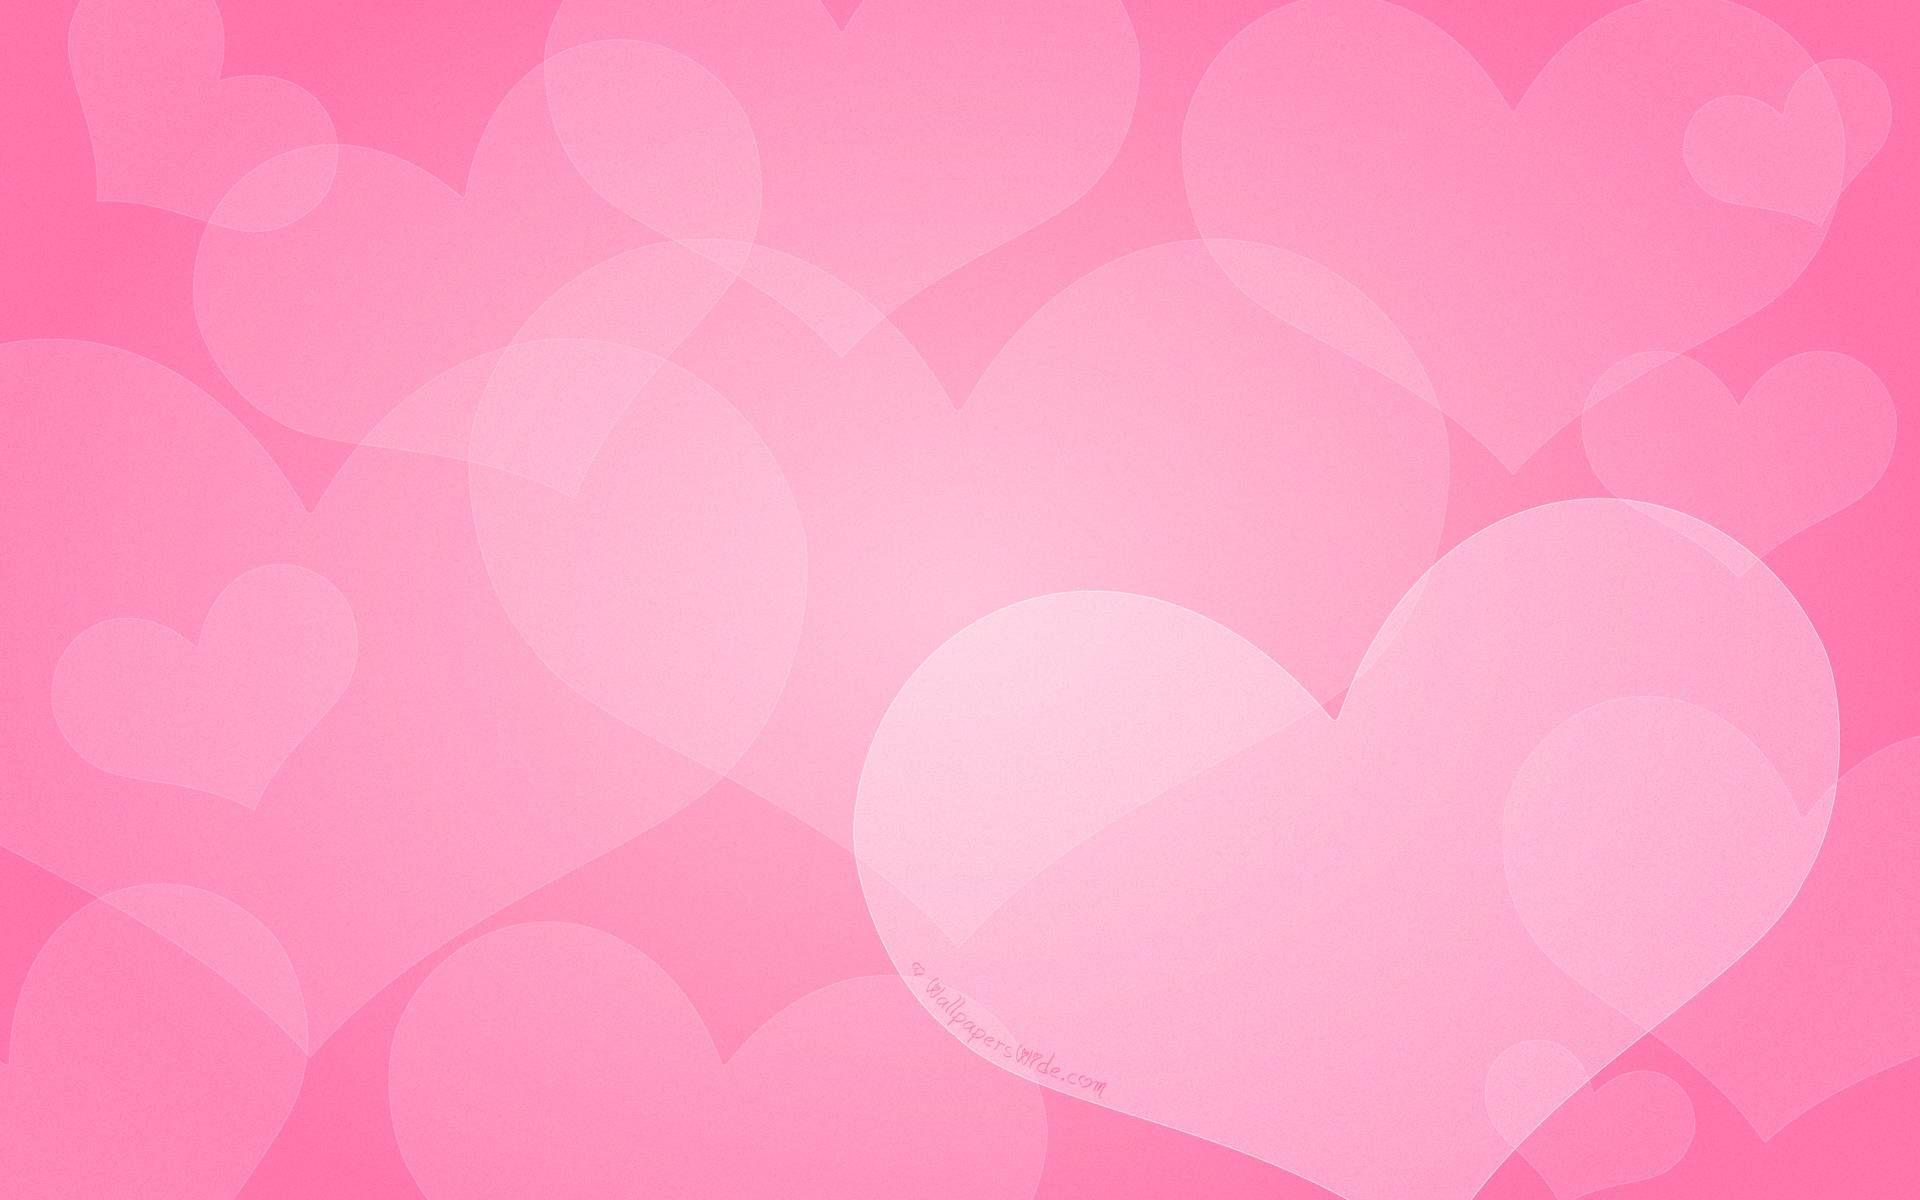 Fontana Ca Pink Wallpaper Love Wallpaper Valentines Day Background